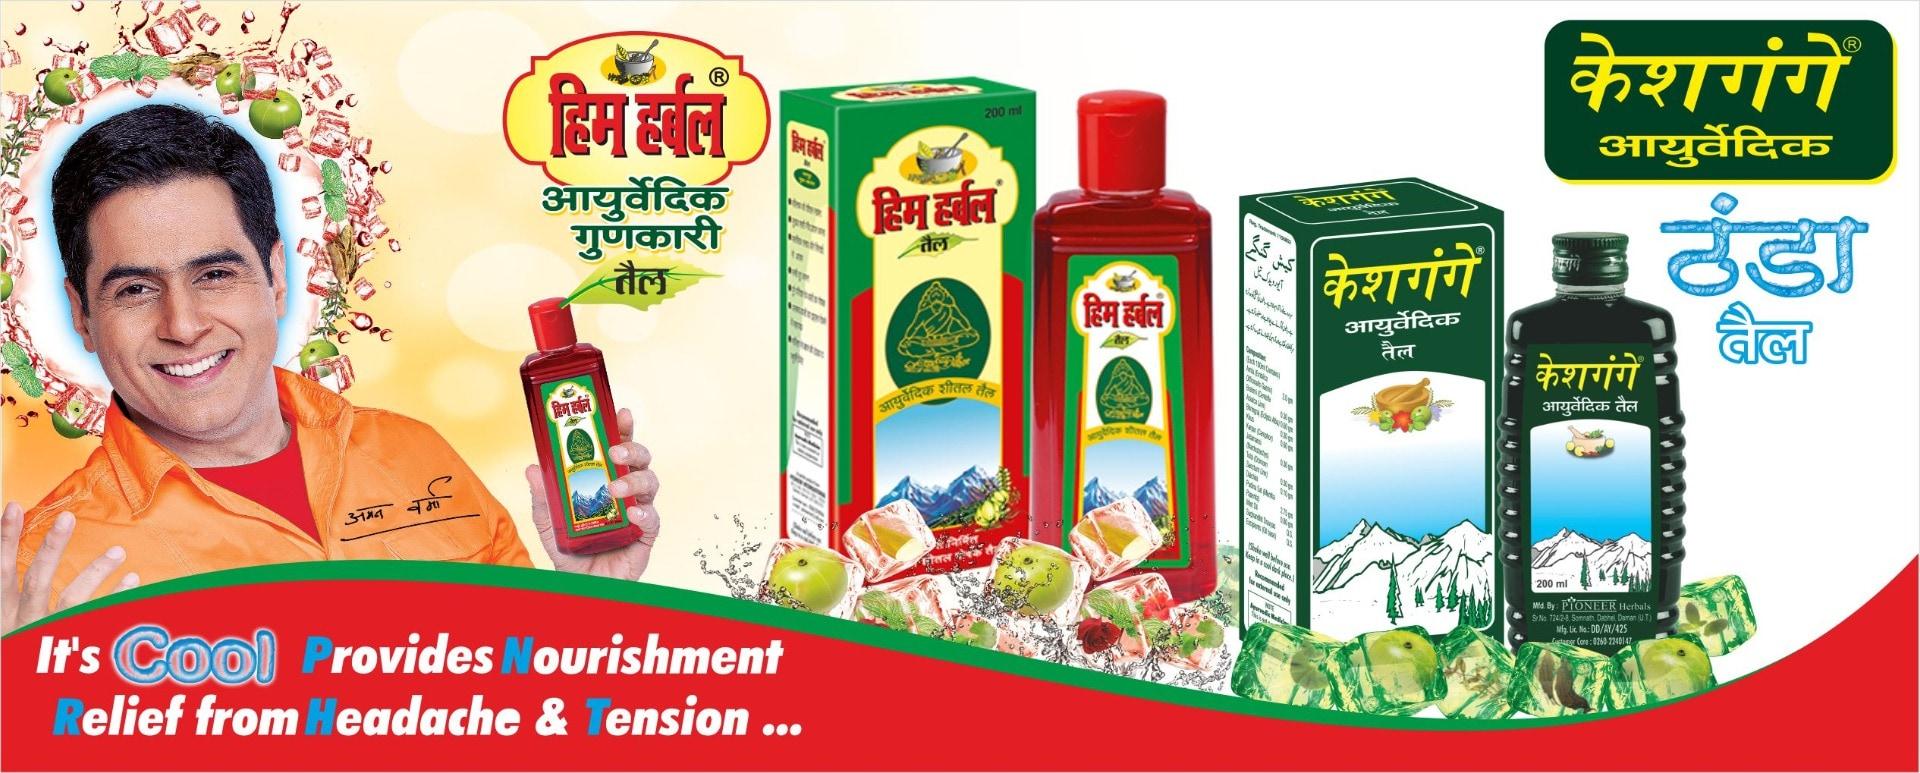 Pioneer Herbals - Ayurvedic Herbal Products and Medicine Dealer in Nani Daman, Daman